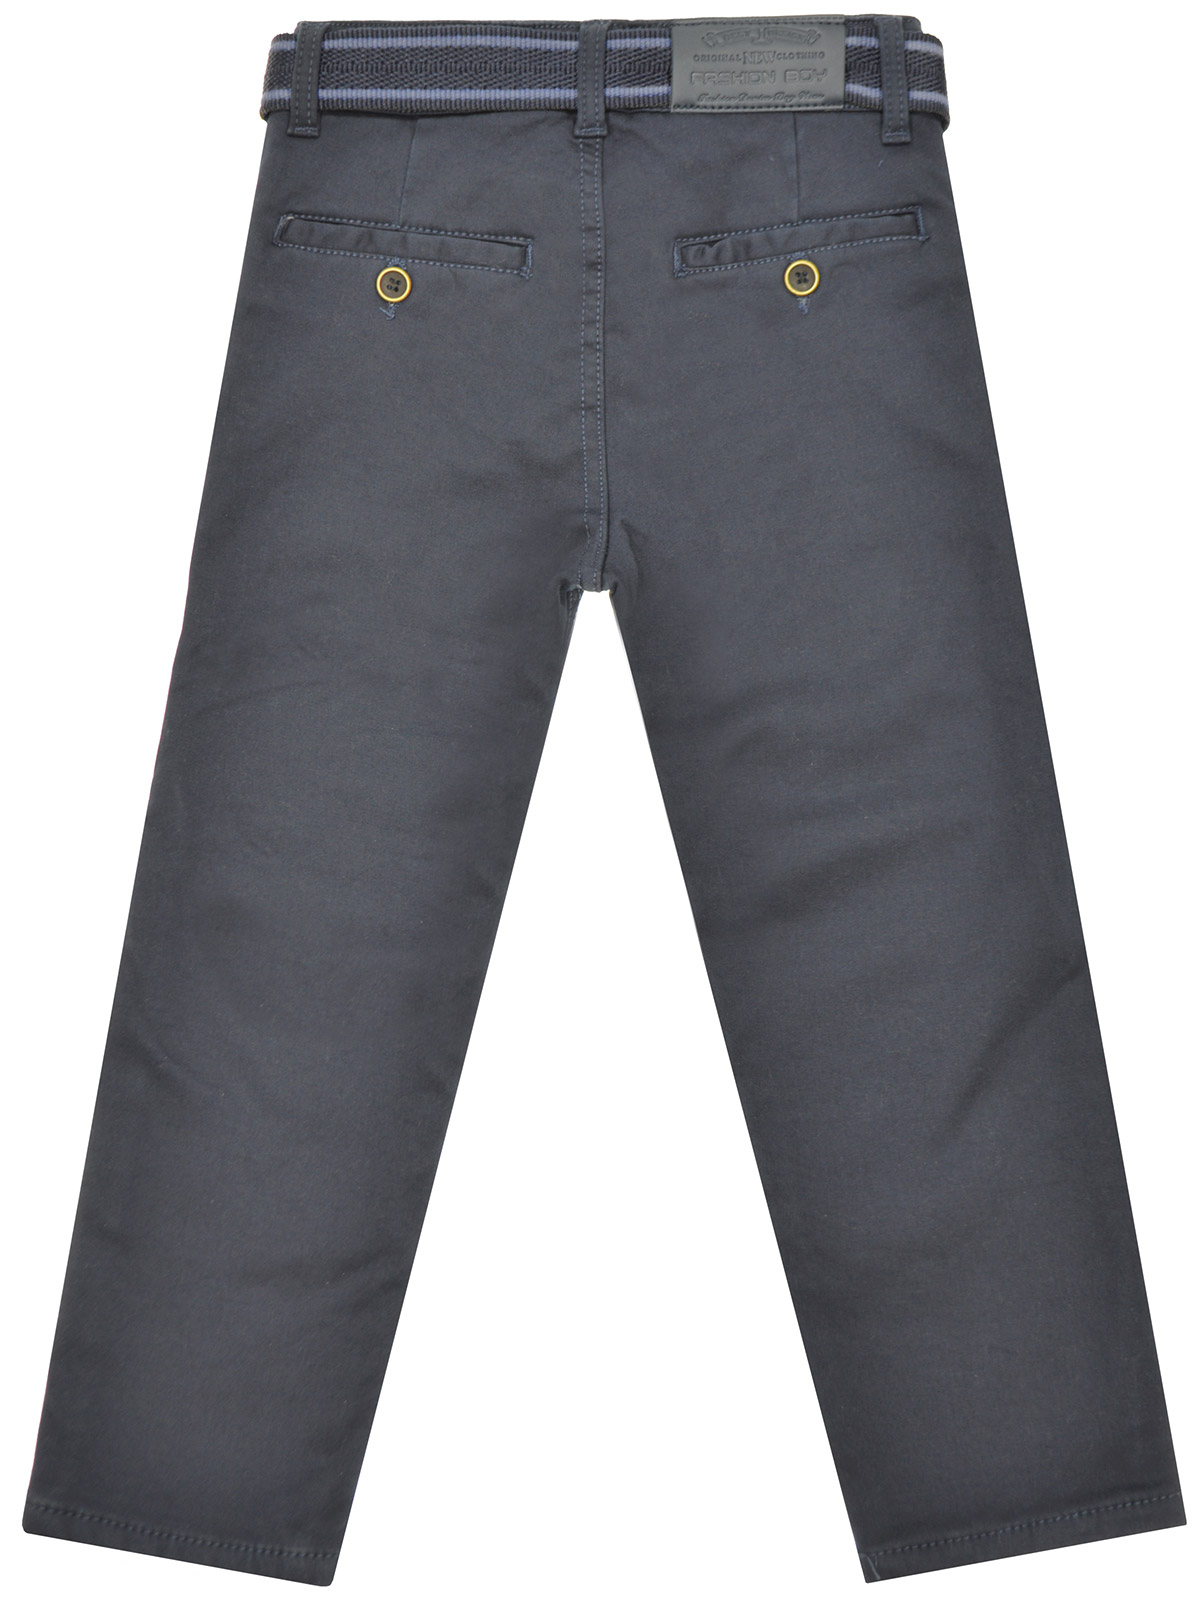 Enfants-Chino-THERMO-d-039-hiver-Pantalons-Garcons-Pantalon-Doublure-Stretch-Reglable-22904 miniature 8